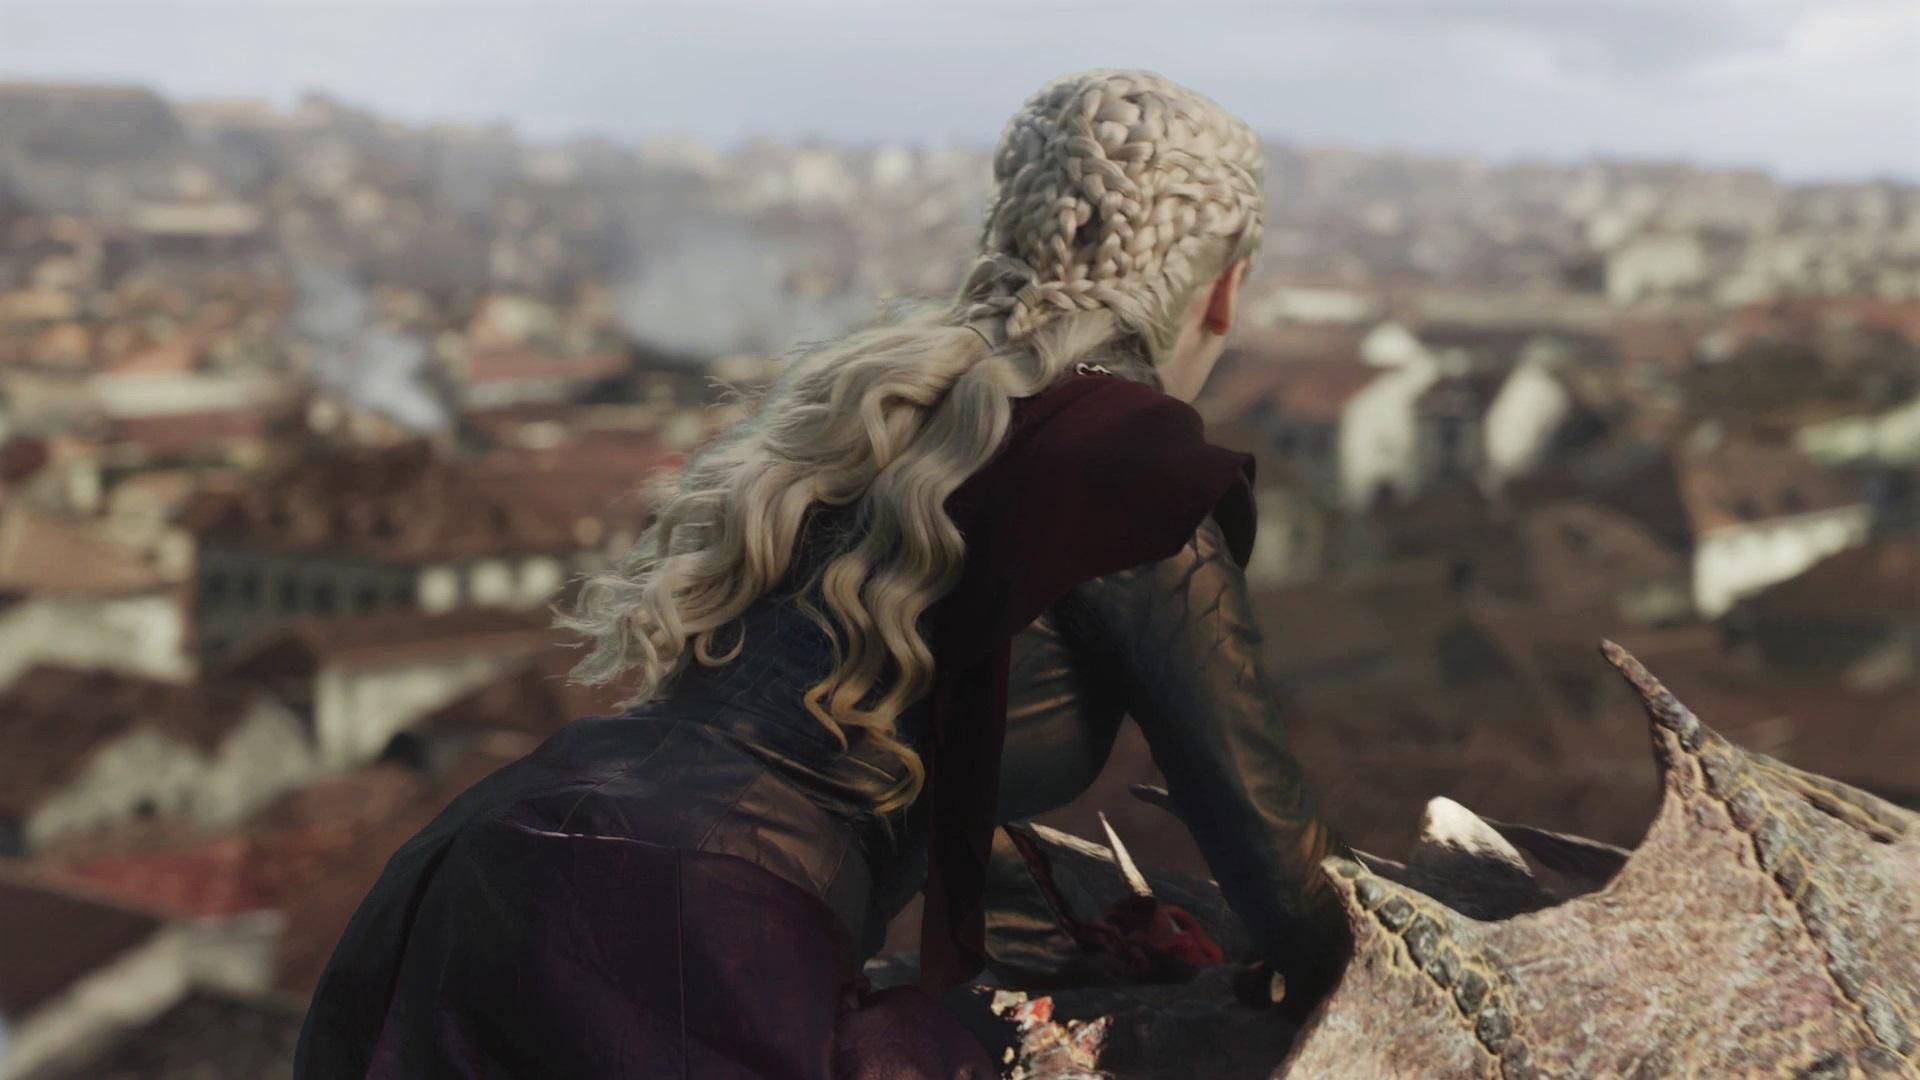 Daenerys Dress Season 8 805 King's Landing Bells